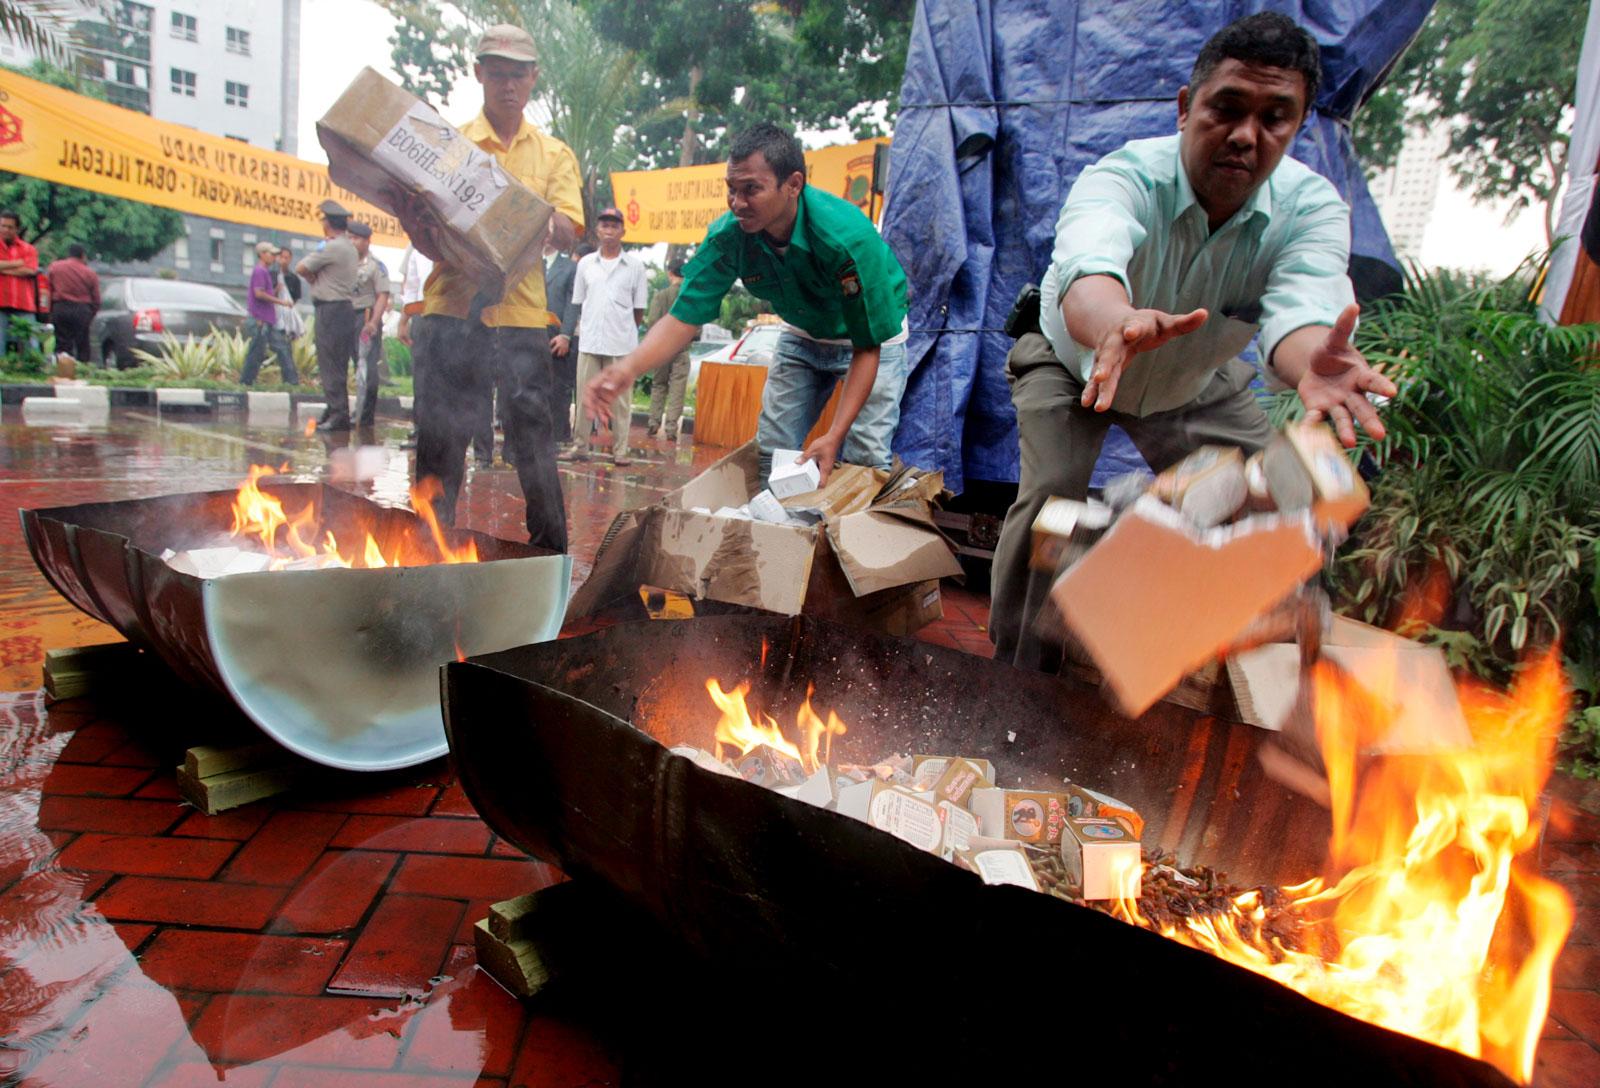 Indonesian policemen burn illegal medicines at Jakarta's police headquarters in late 2007. Photo: EPA/Mast Irha